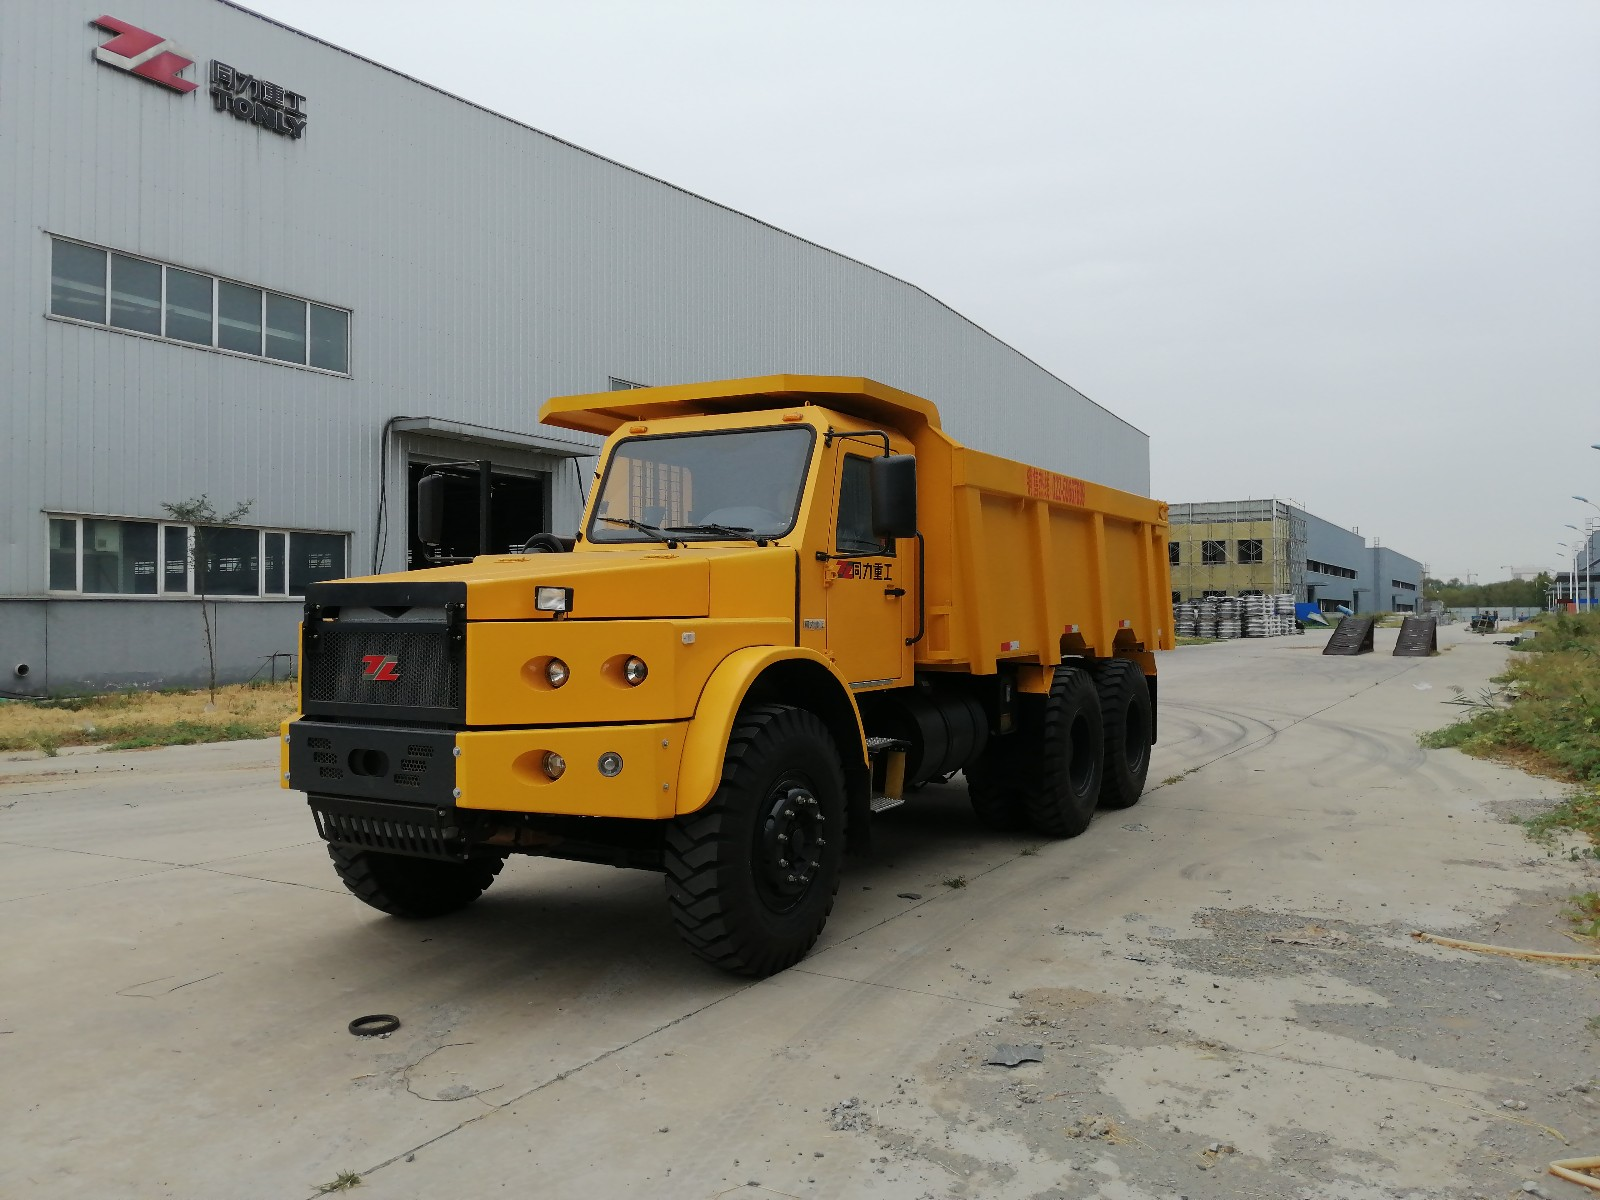 TLK301 Tunnel truck